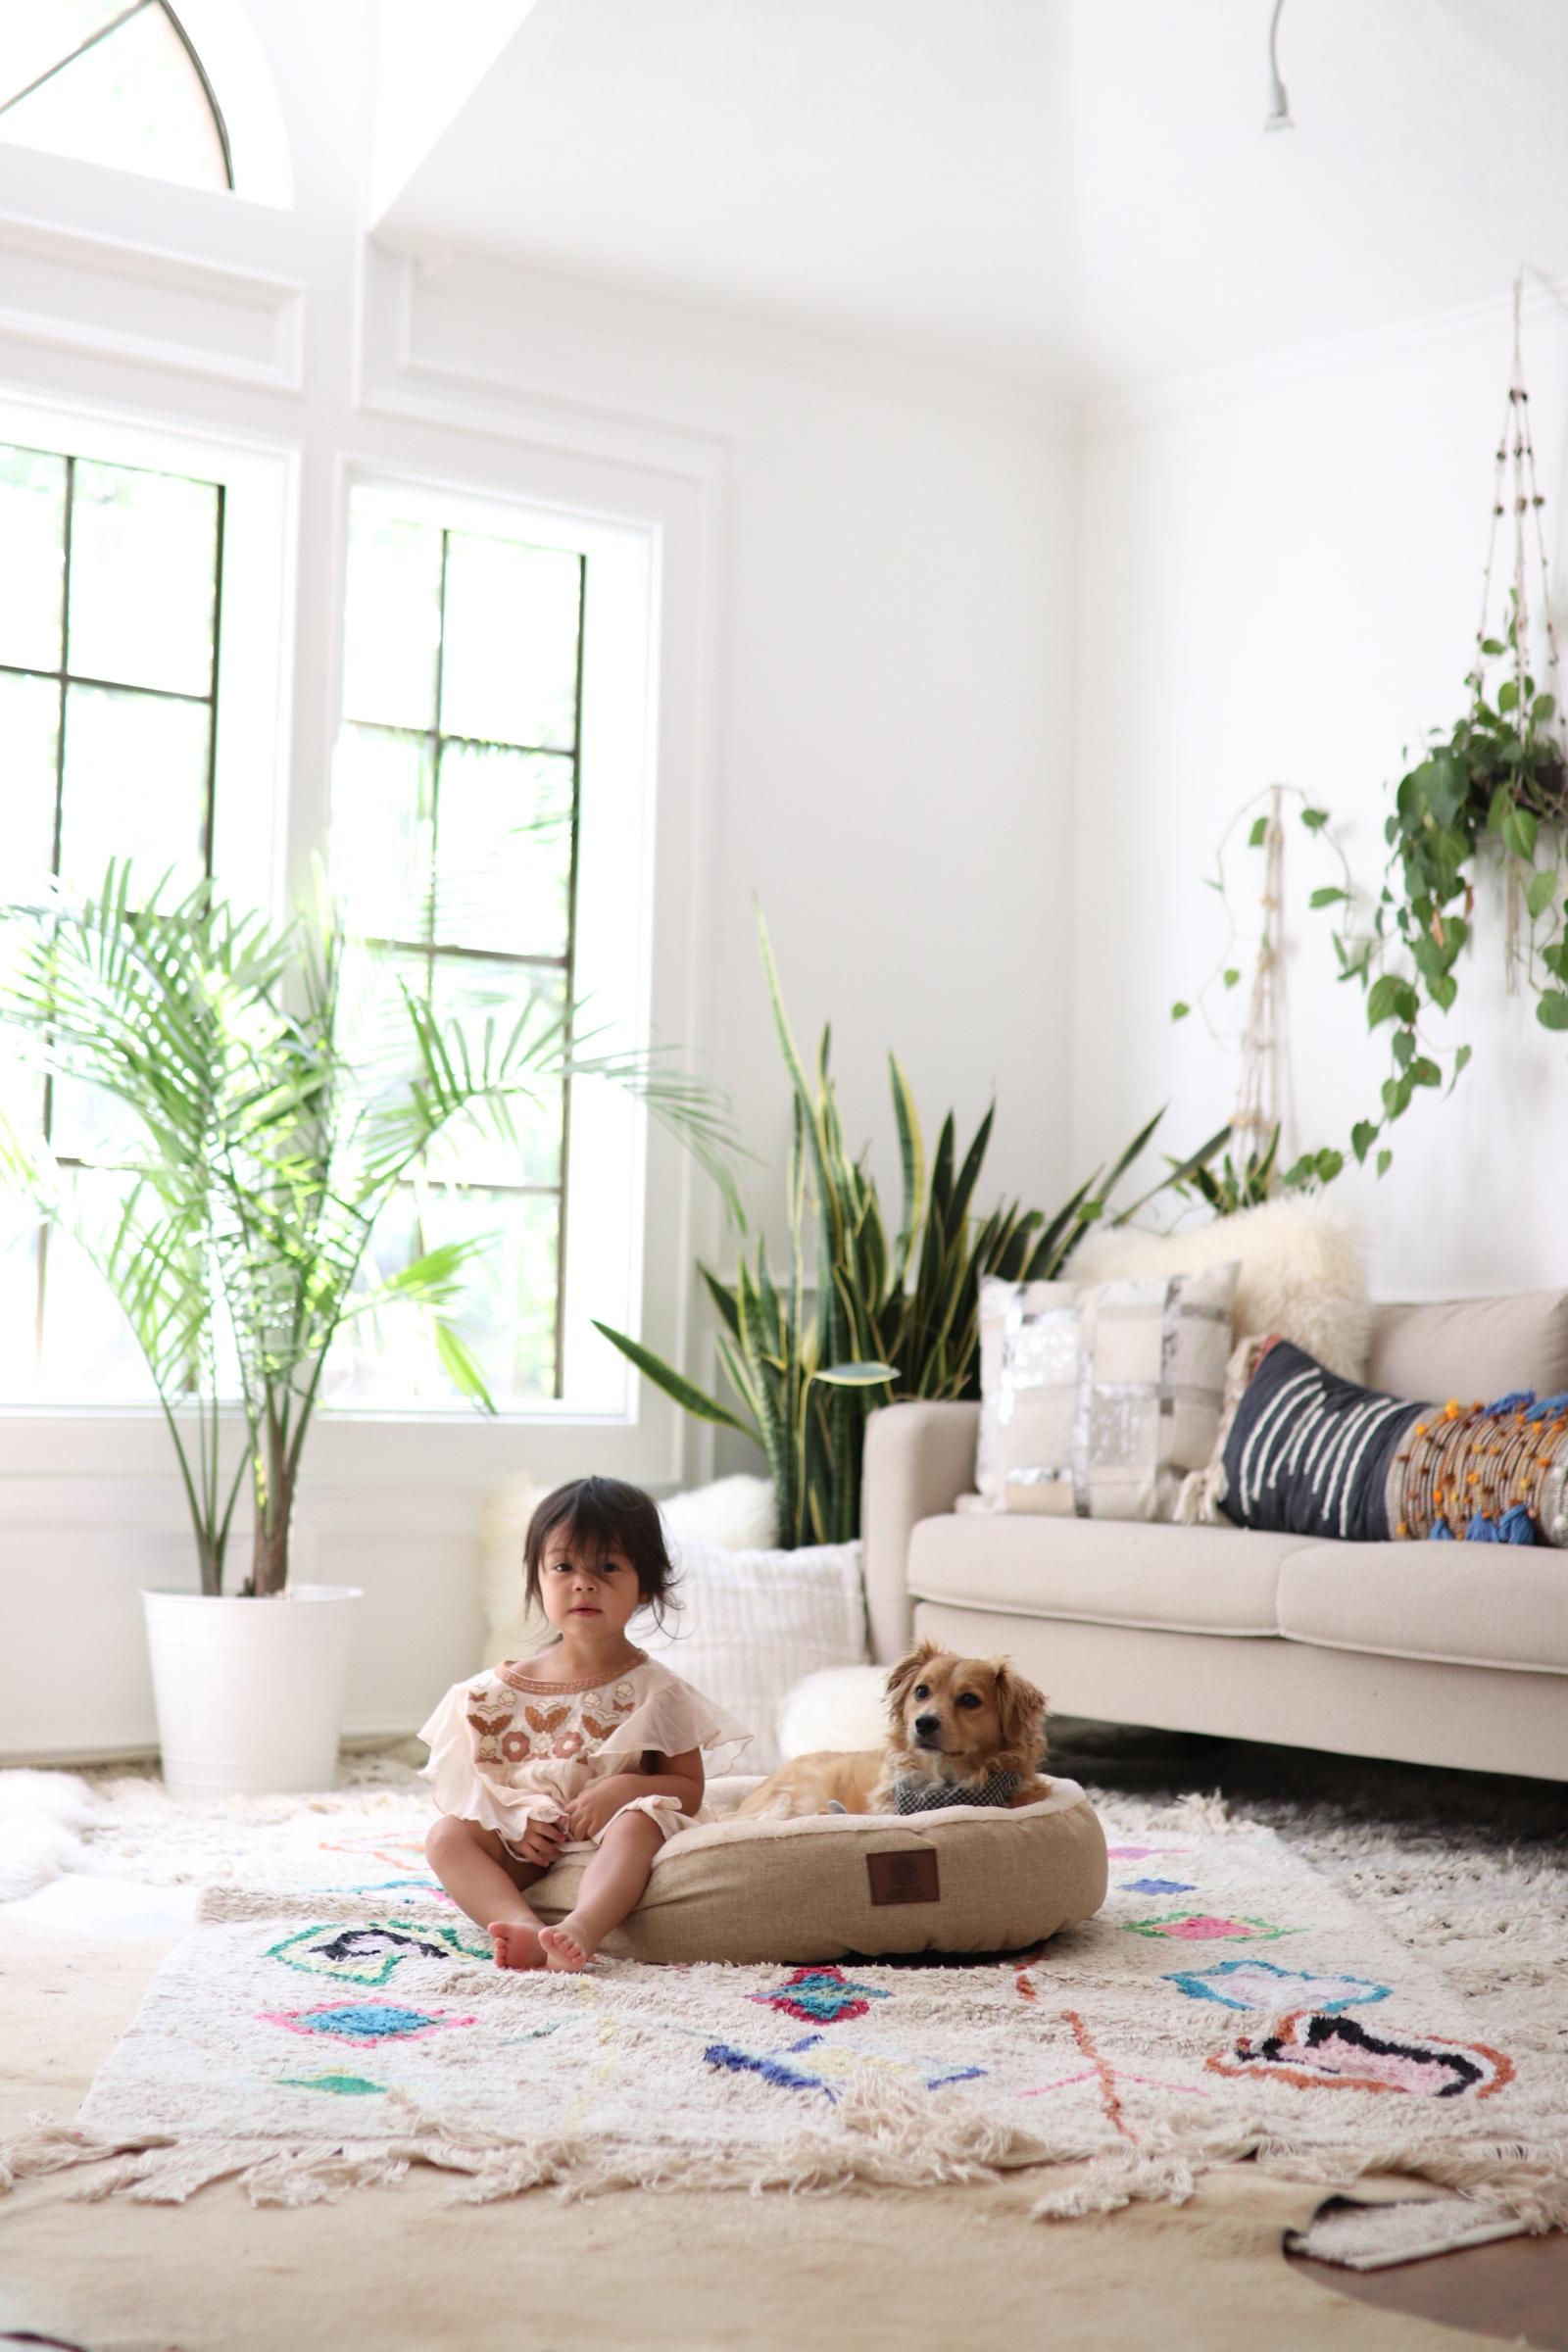 Joyfullygreen Gordman's National Pet Day Baby and Puppy Love-05.jpg